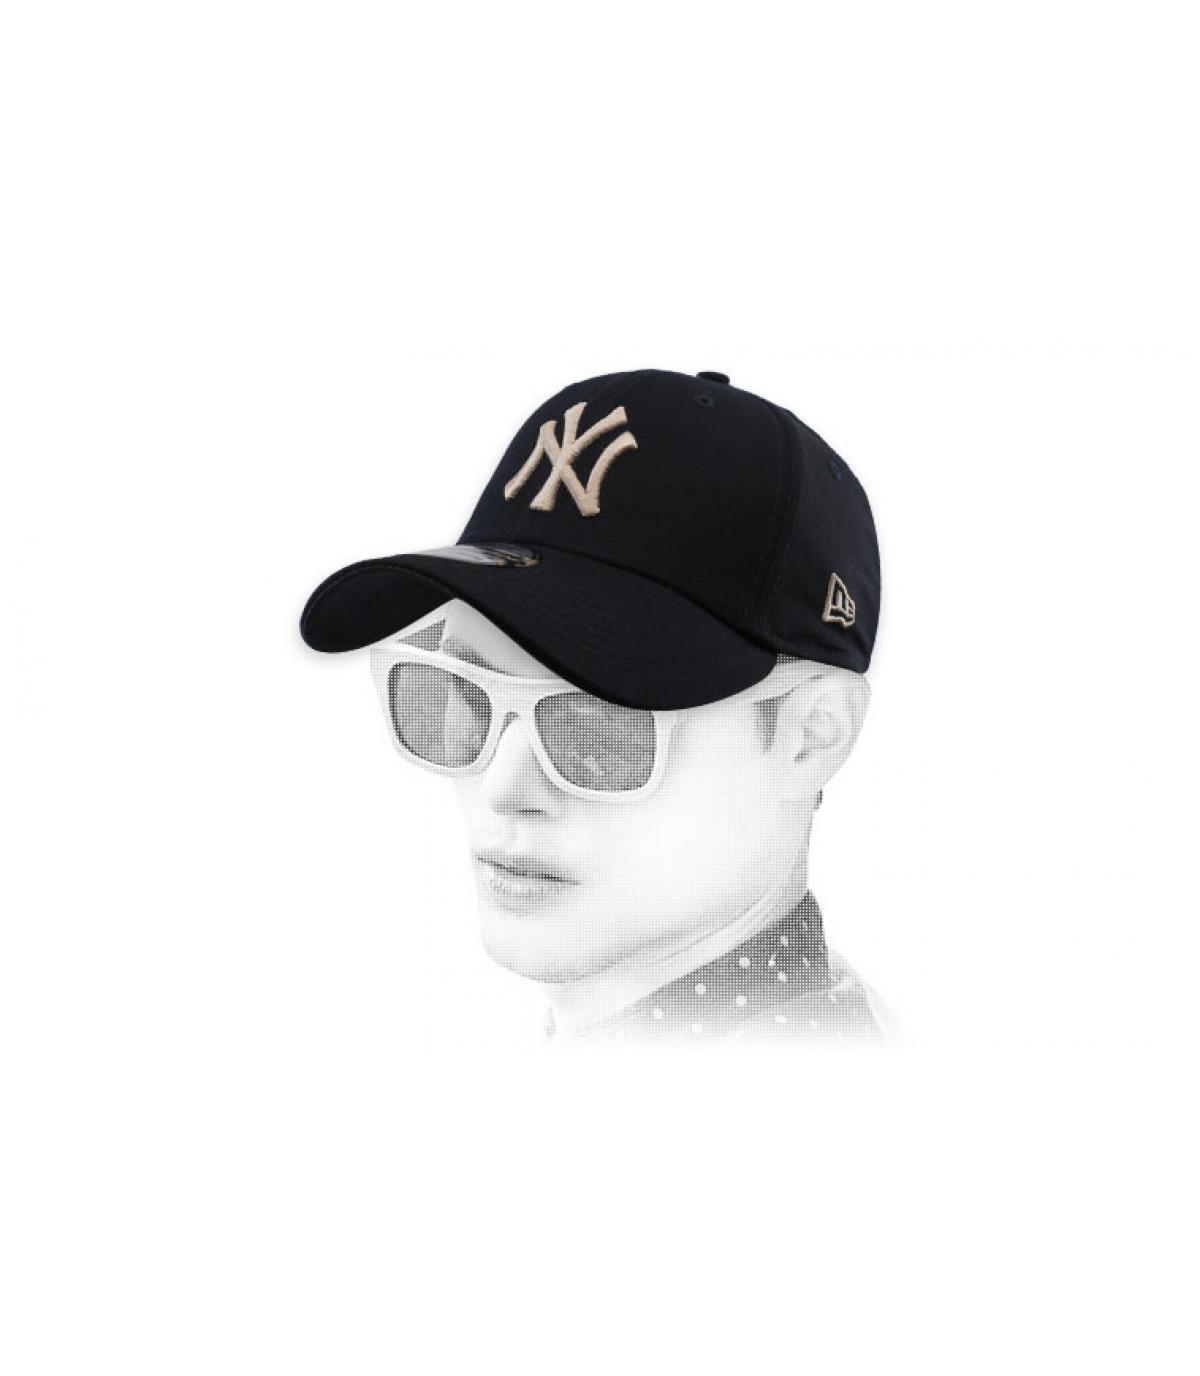 casquette NY noir stretch